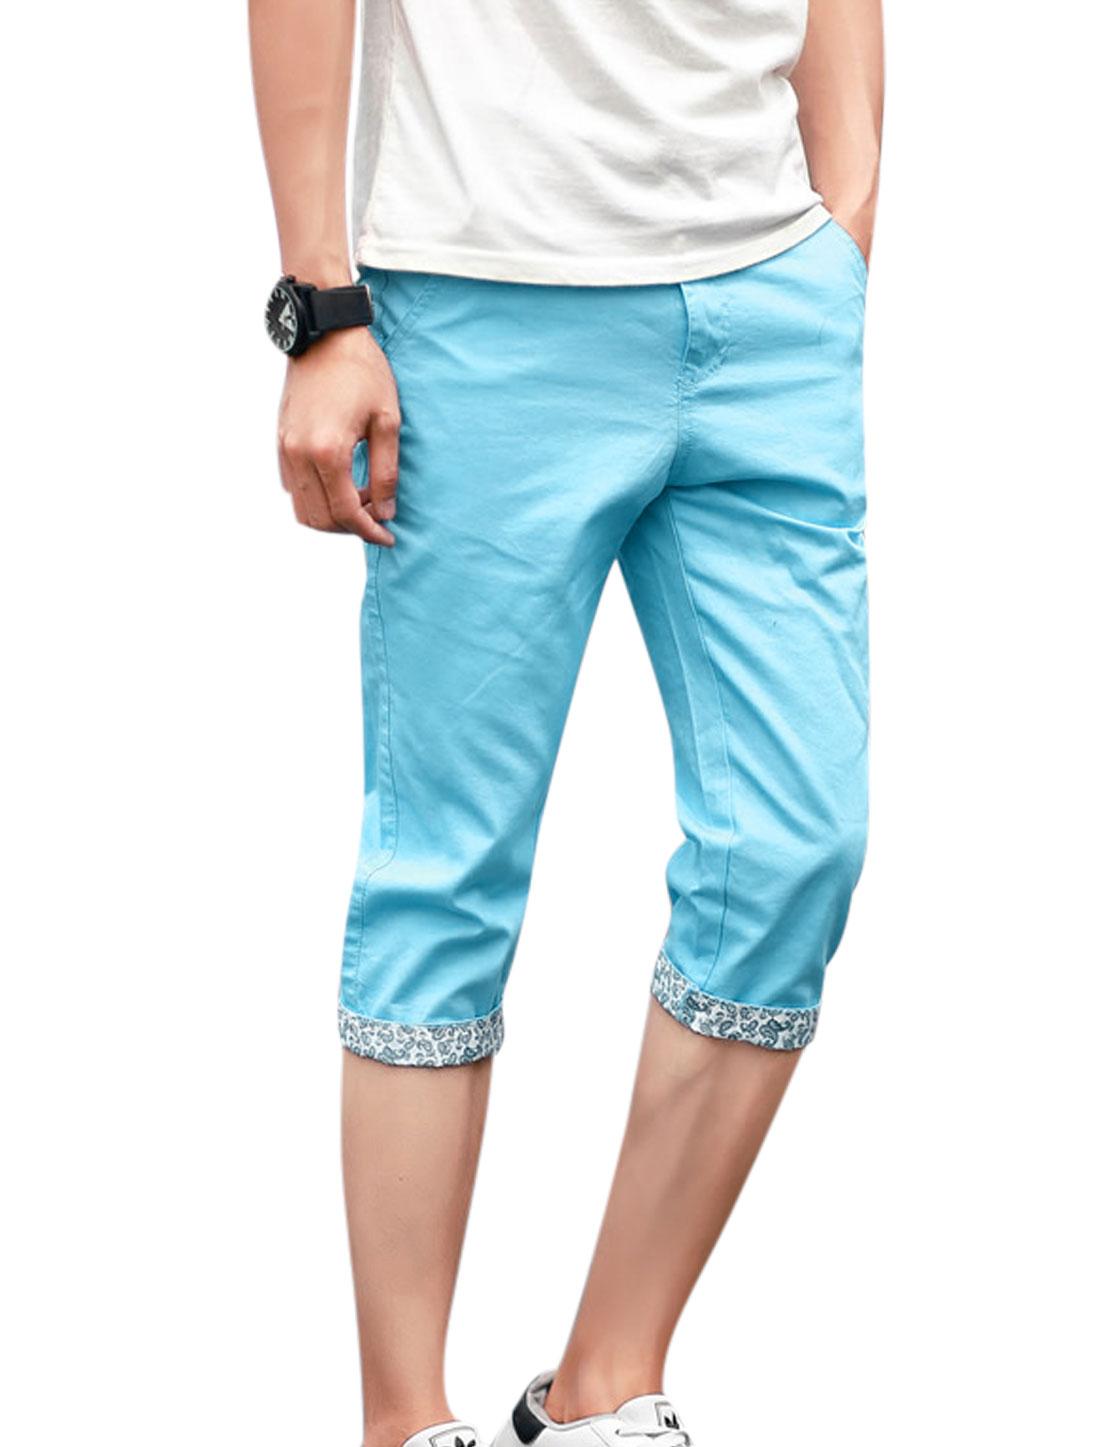 Men Mid Waist Zip Fly Front Pockets Capris Pants Sky Blue W32